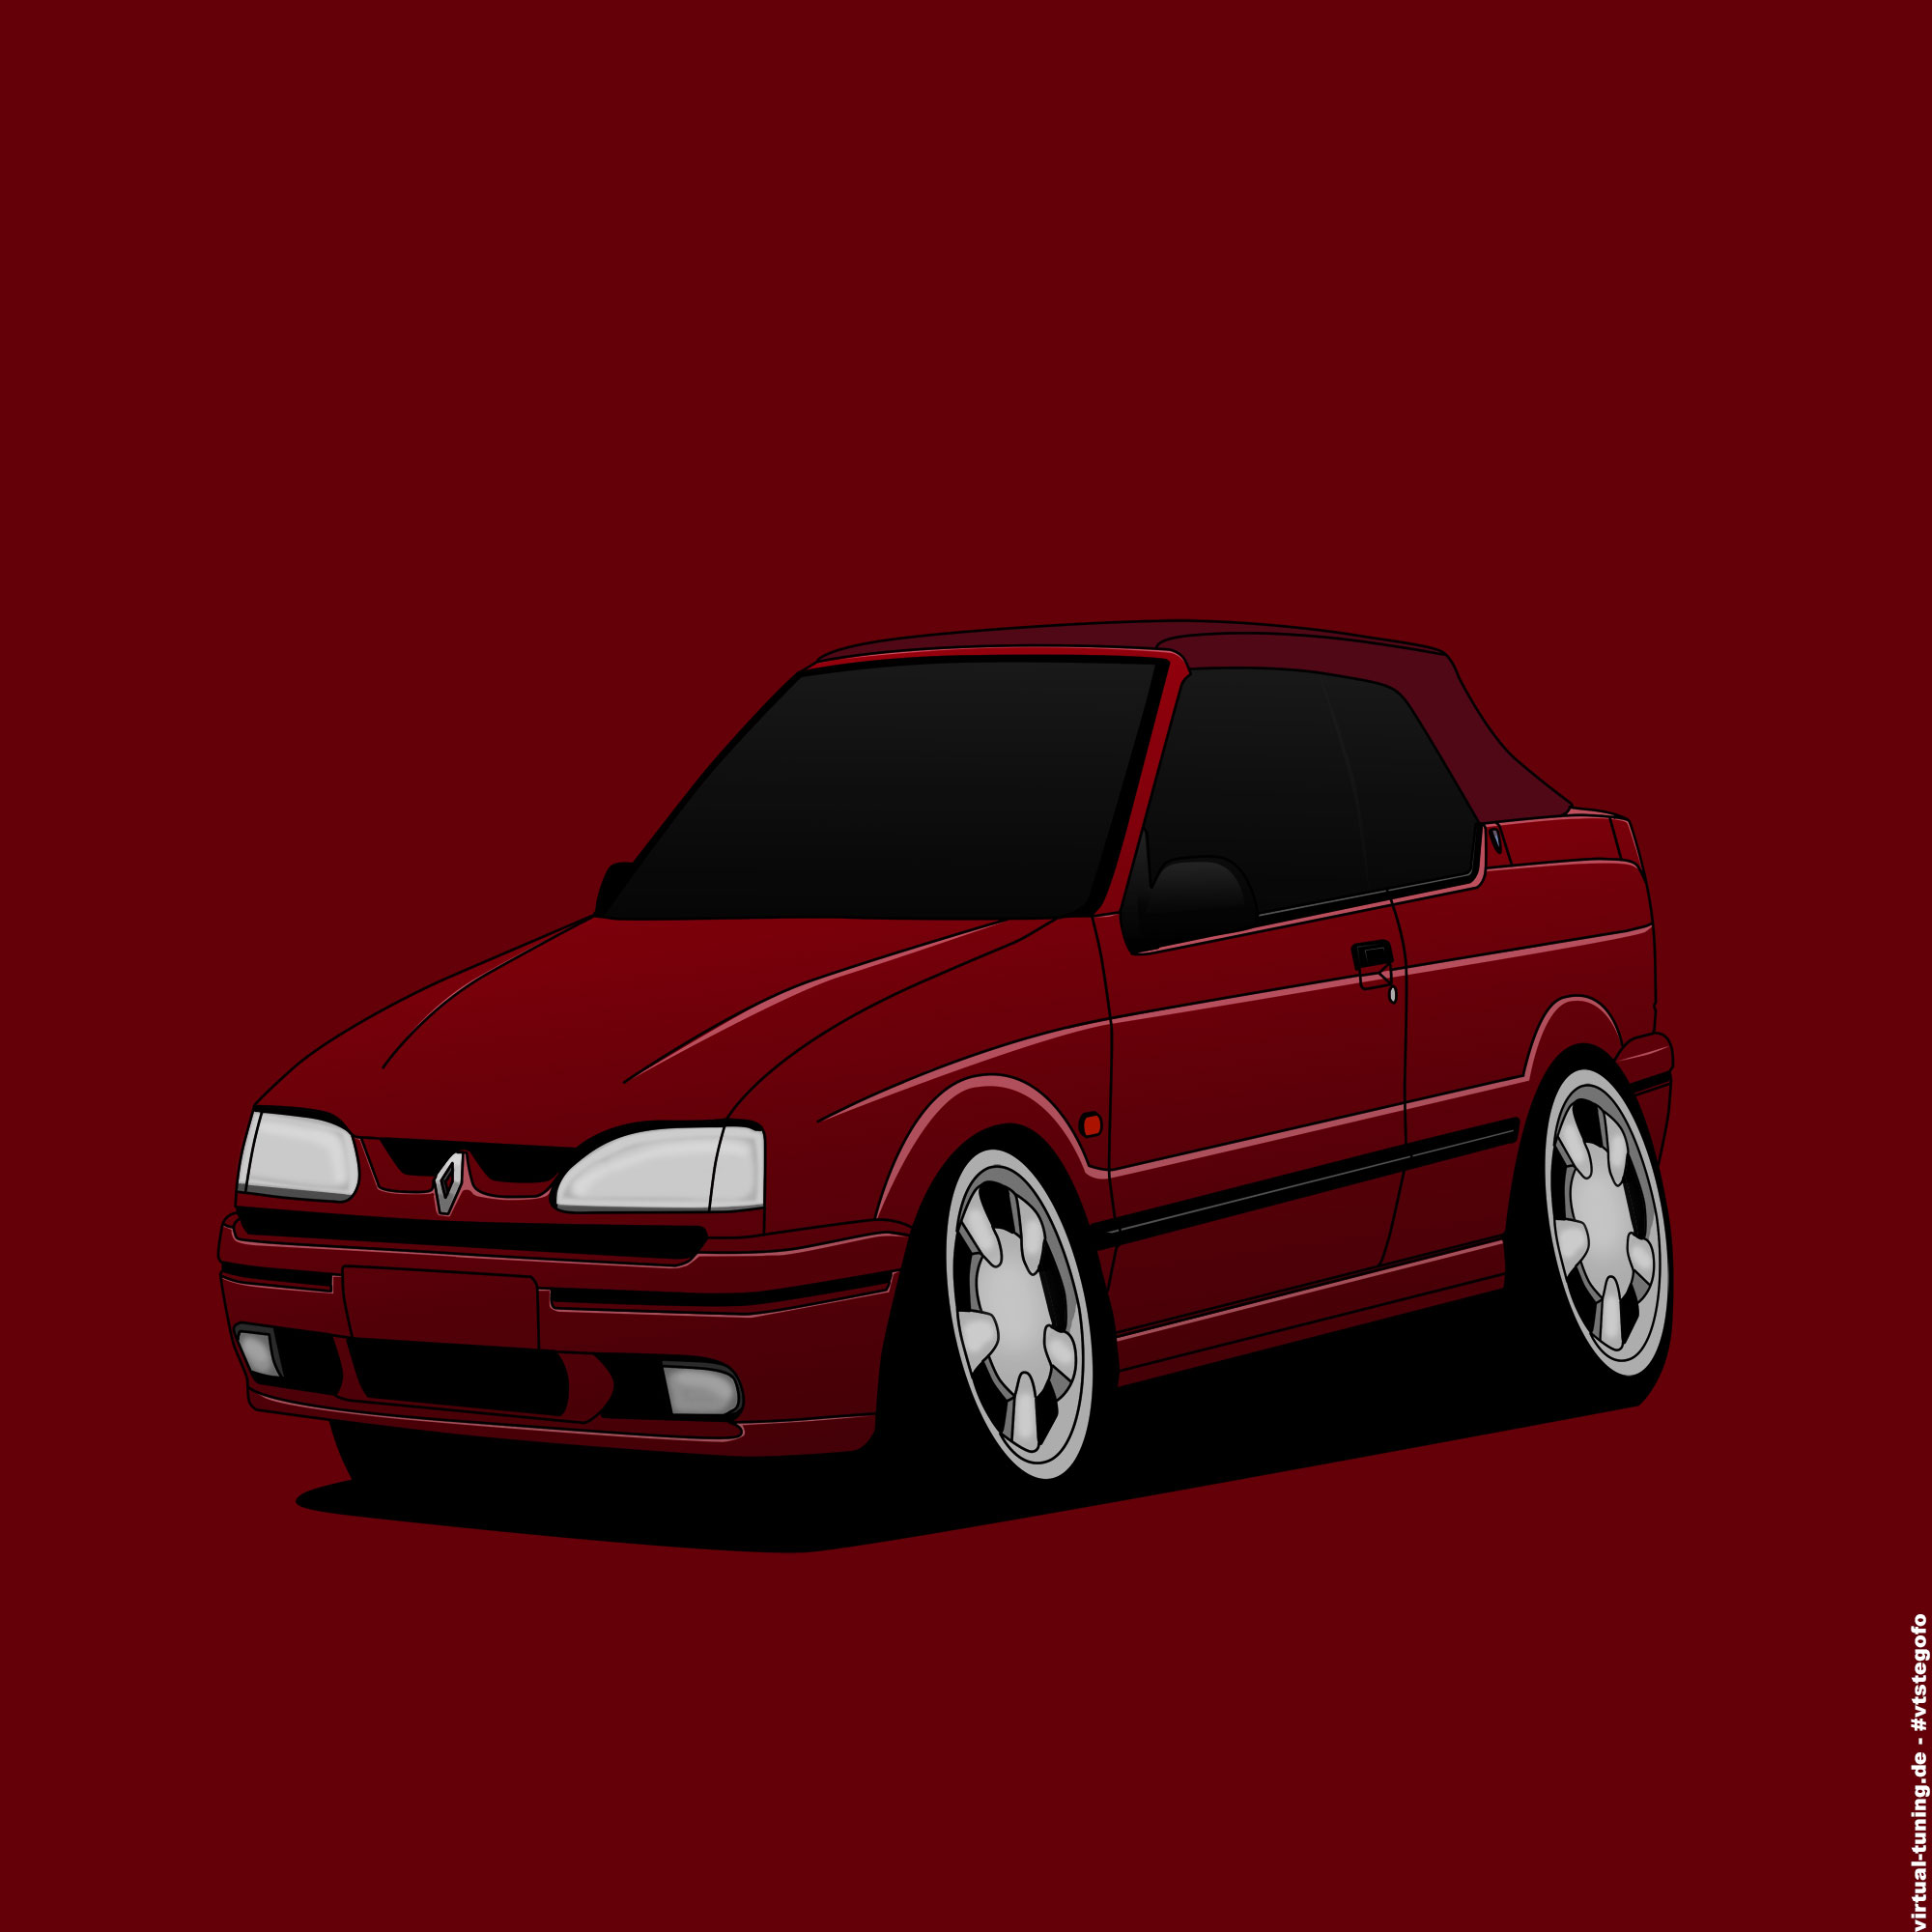 Renault 19 RSI Cabriolet - Cartoon by vtstegofo